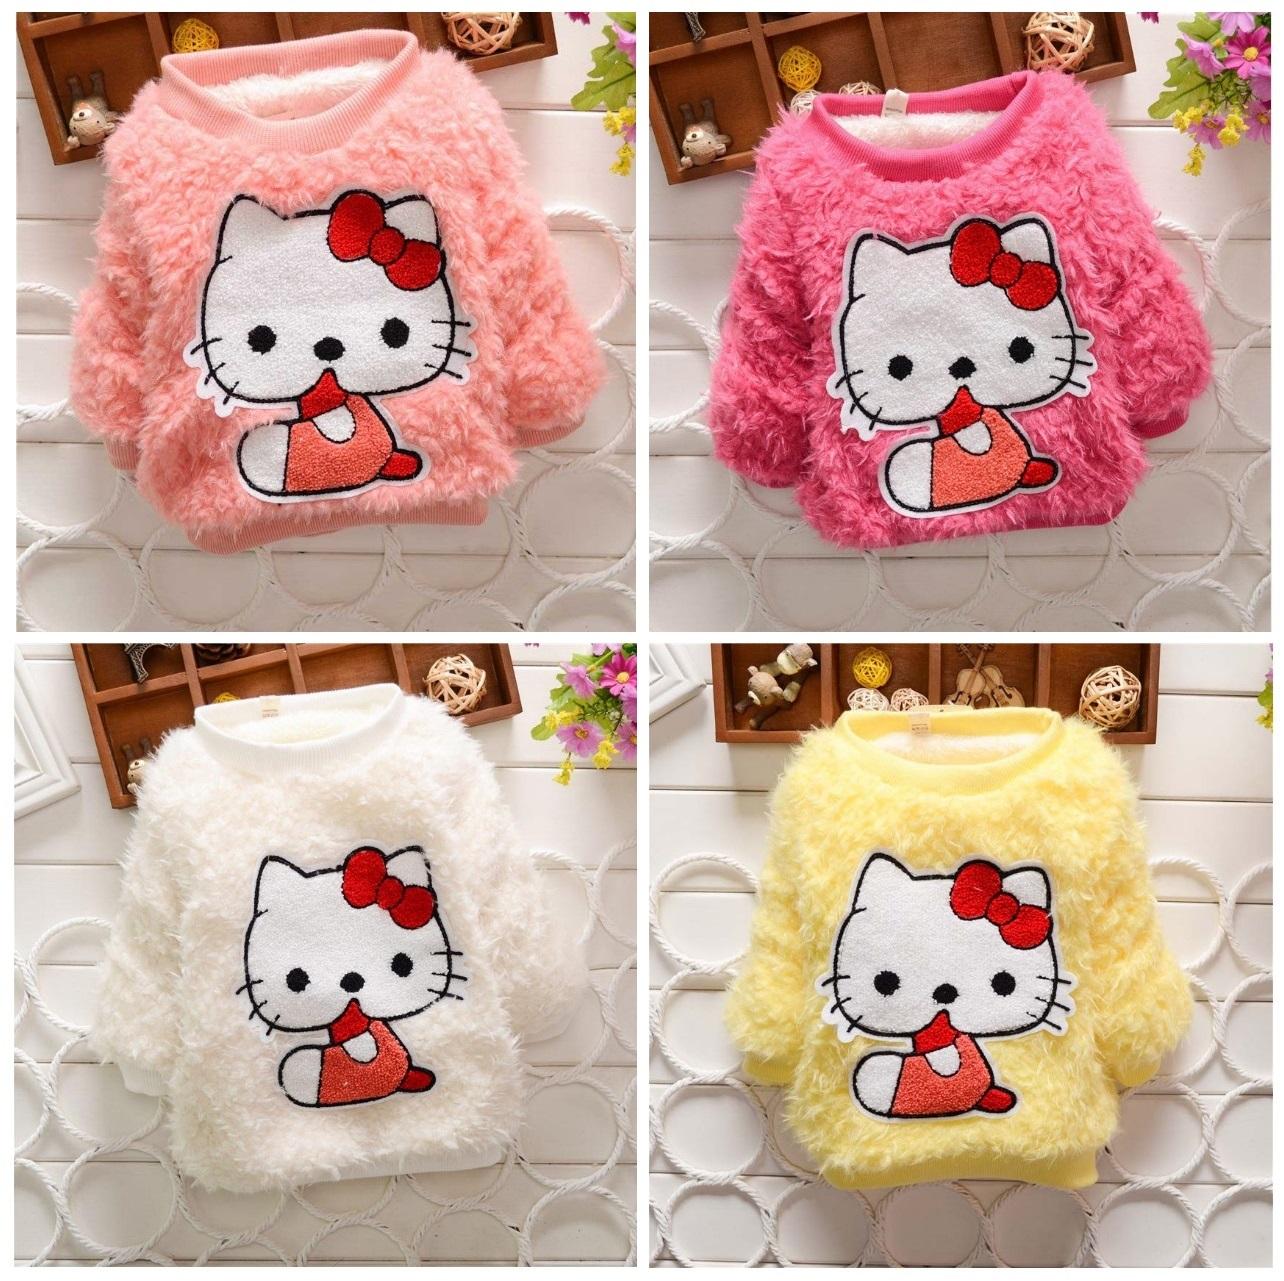 Dětský svetřík - Hello Kitty / dnk-13-01282